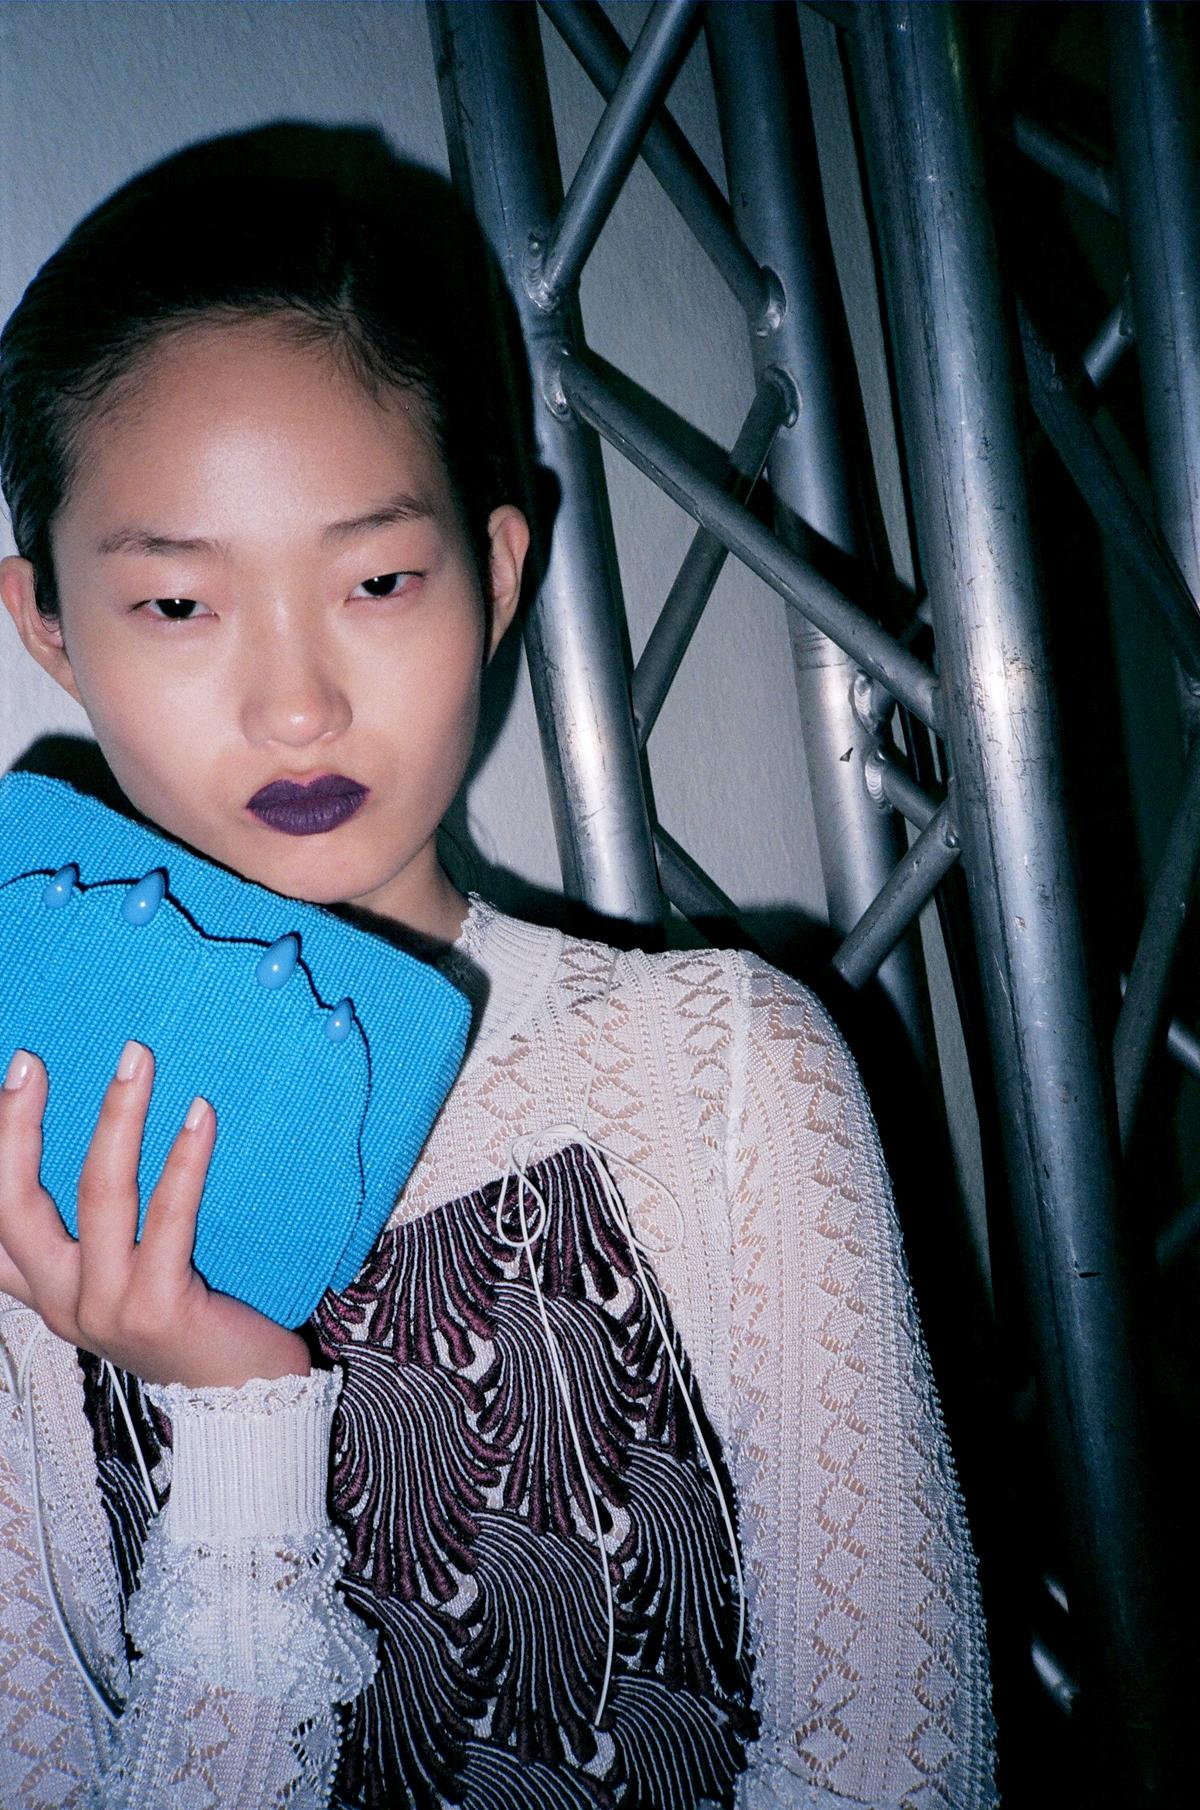 Hyun Ji backstage at the Marco De Vincenzo SS17 show at Milan Fashion Week